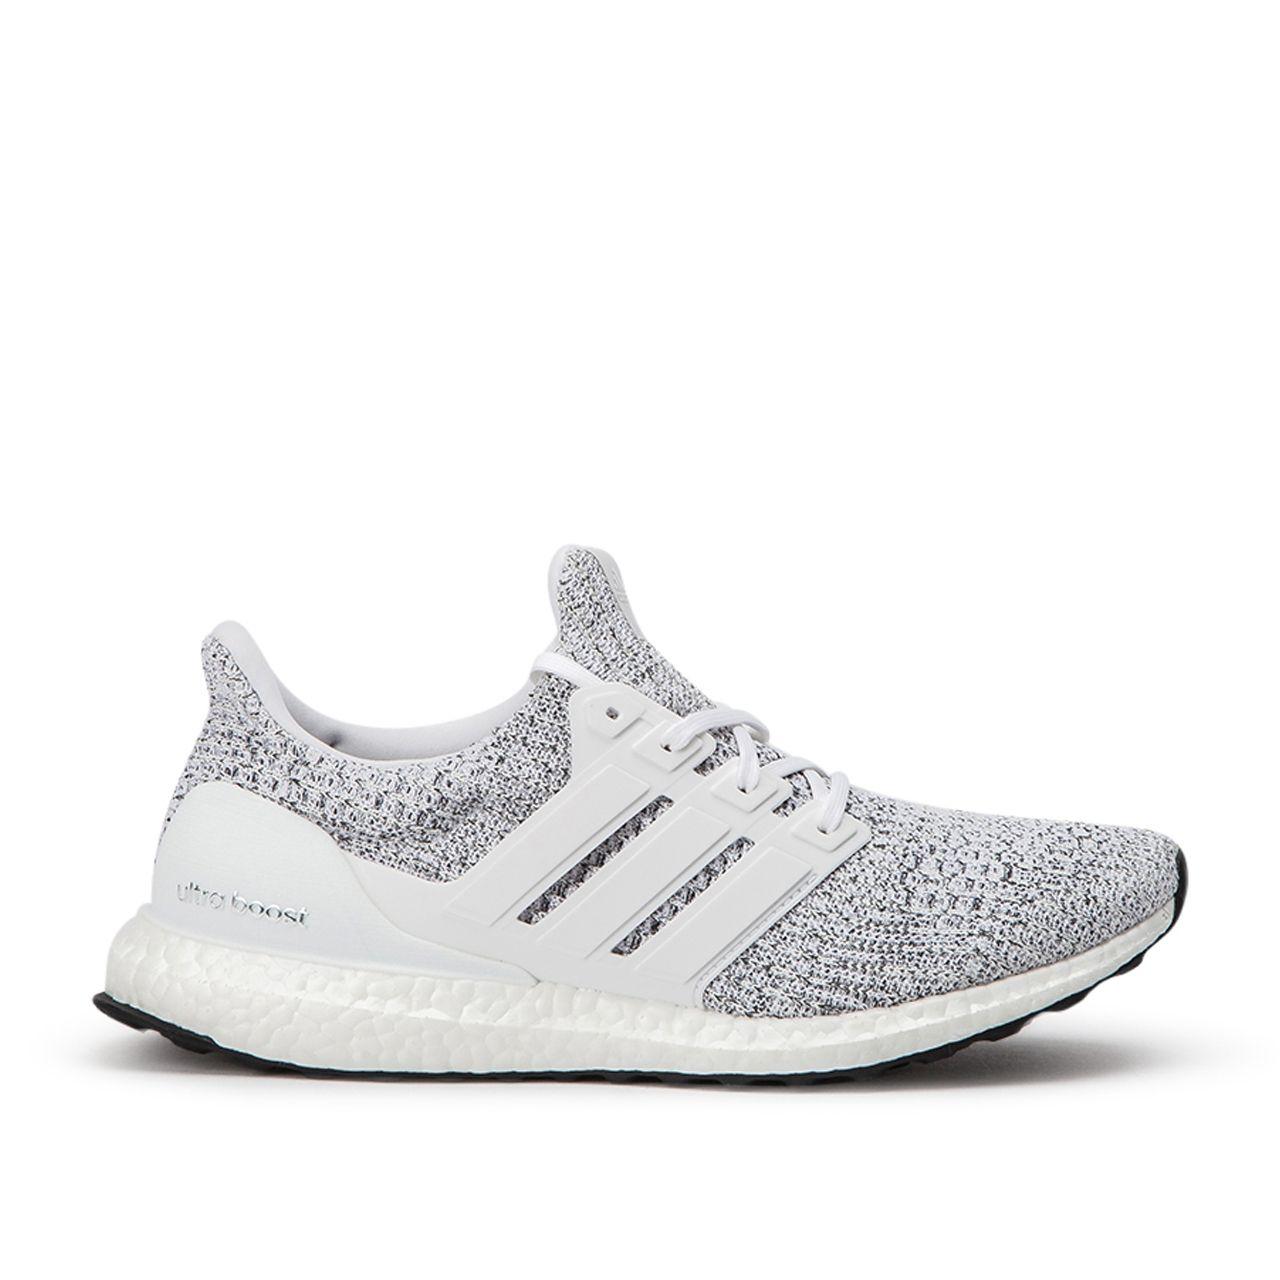 Adidas Ultra Boost Weiss Grau Sneaker Lpu Adidas Grau Schuhgrossen